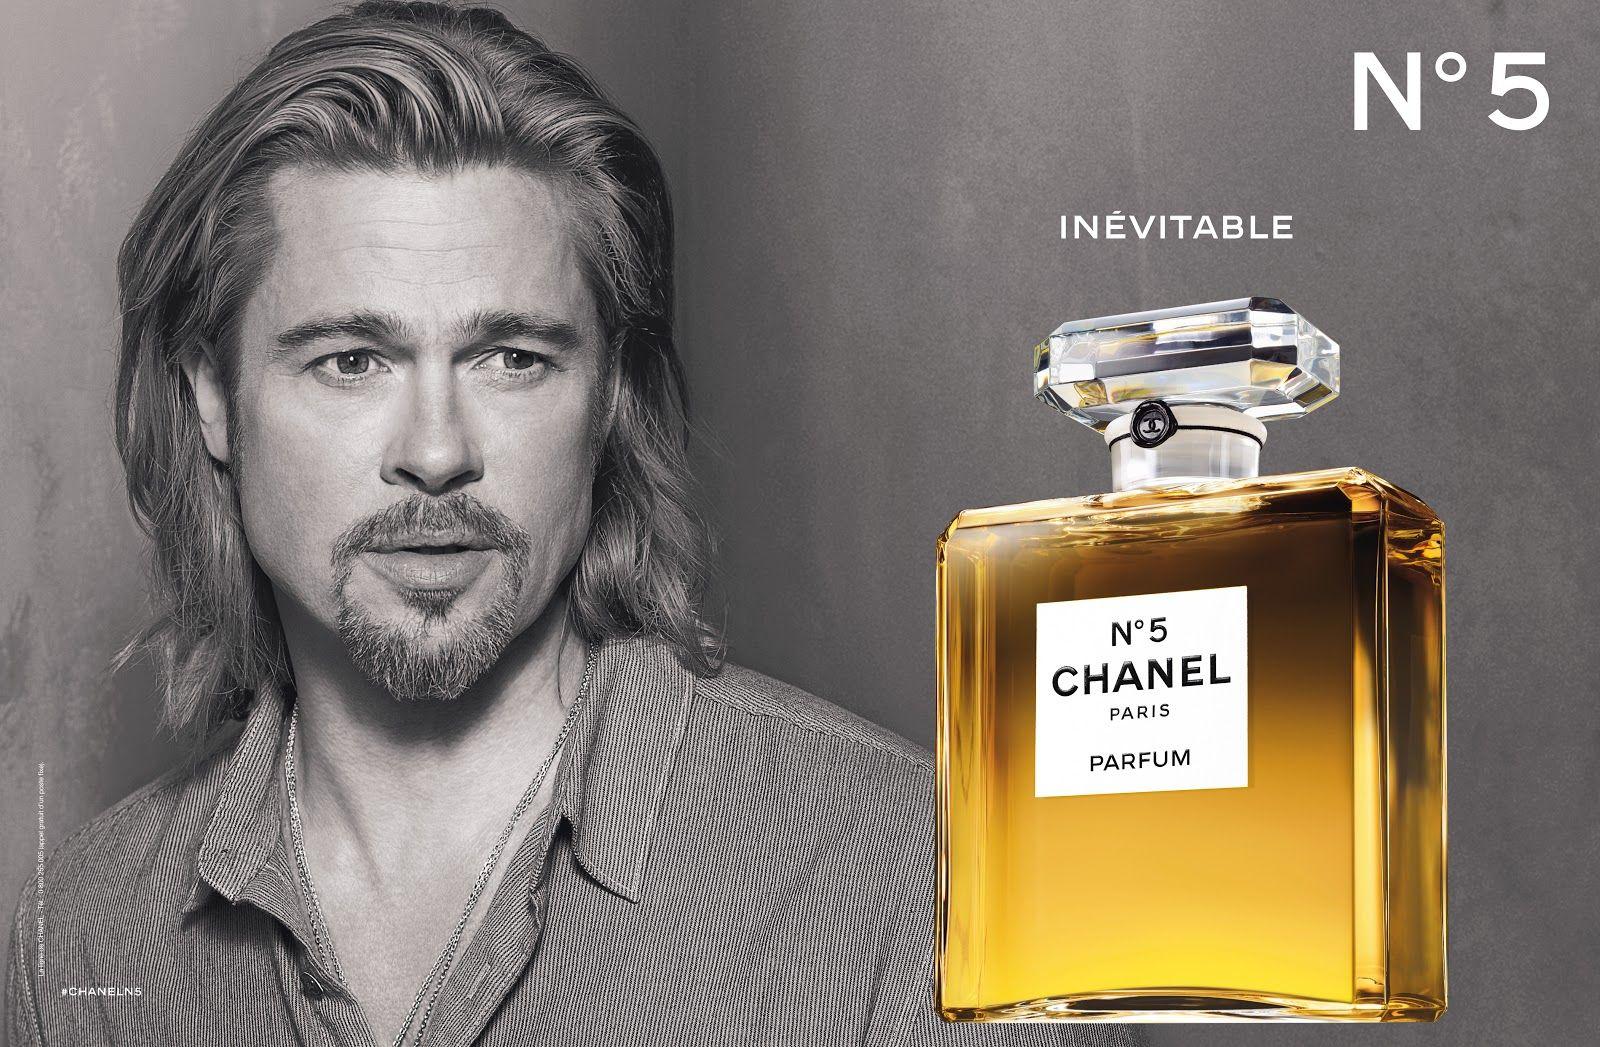 Brad Pitt for CHANEL N°5 (2012, by Mario Sorrenti) #ChanelN5 Visit espritdegabrielle.com | L'héritage de Coco Chanel #espritdegabrielle